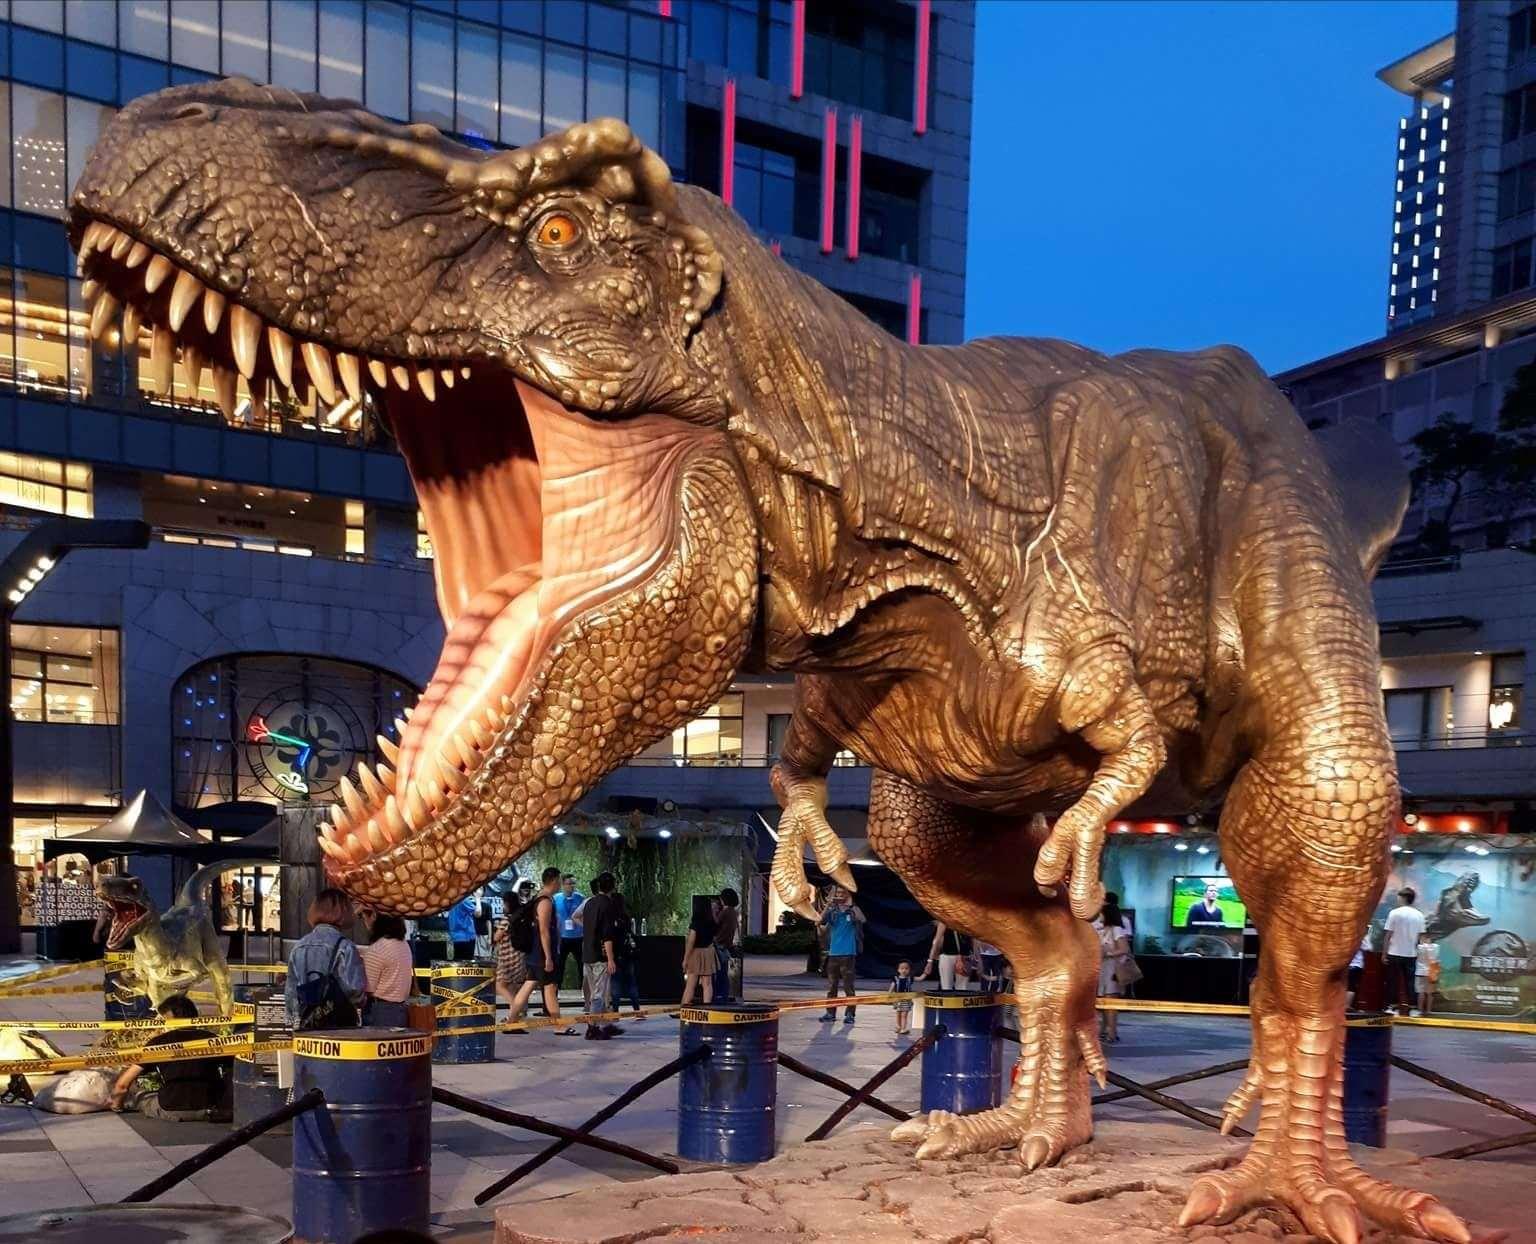 Movie, Jurassic World: Fallen Kingdom(美國) / 侏羅紀世界:殞落國度(台) / 侏罗纪世界2(中) / 侏羅紀世界:迷失國度(港), 電影主題展, 《侏羅紀世界:殞落國度》蠻荒探險